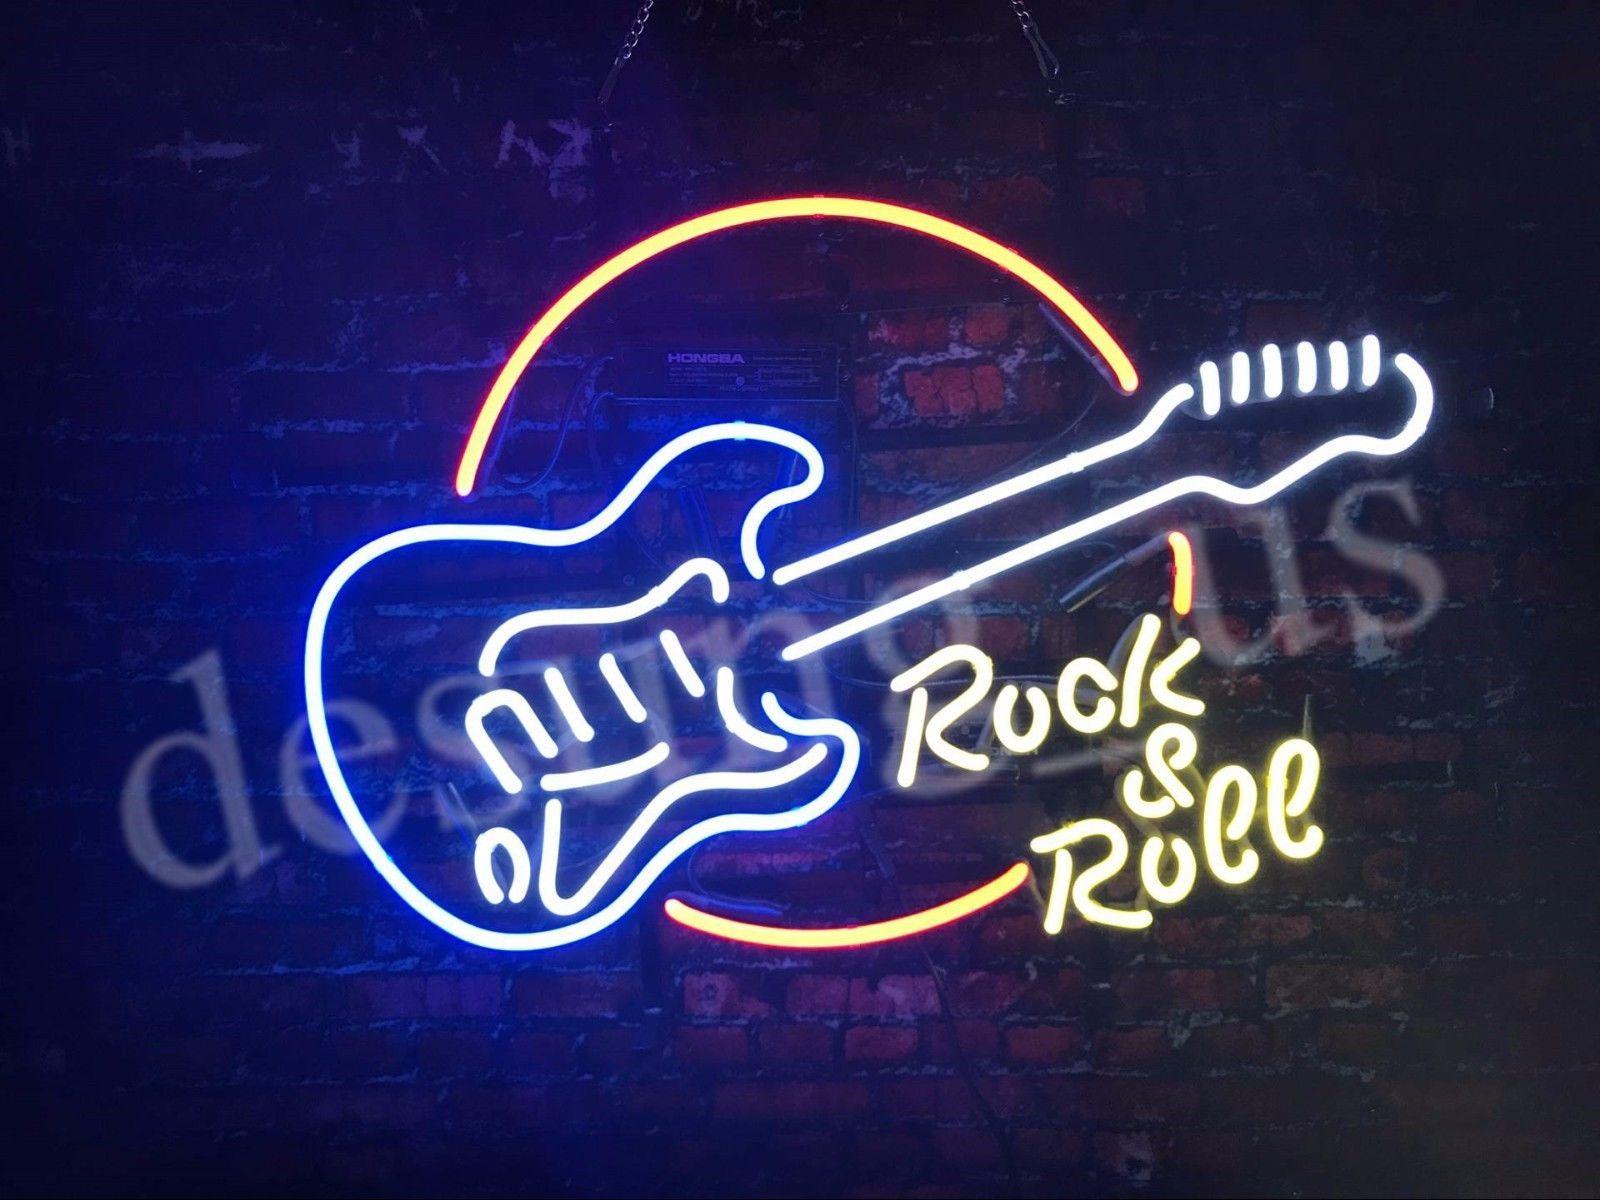 "New Rock Roll Guitar Live Music Bar Beer Neon Sign 24""x20"""